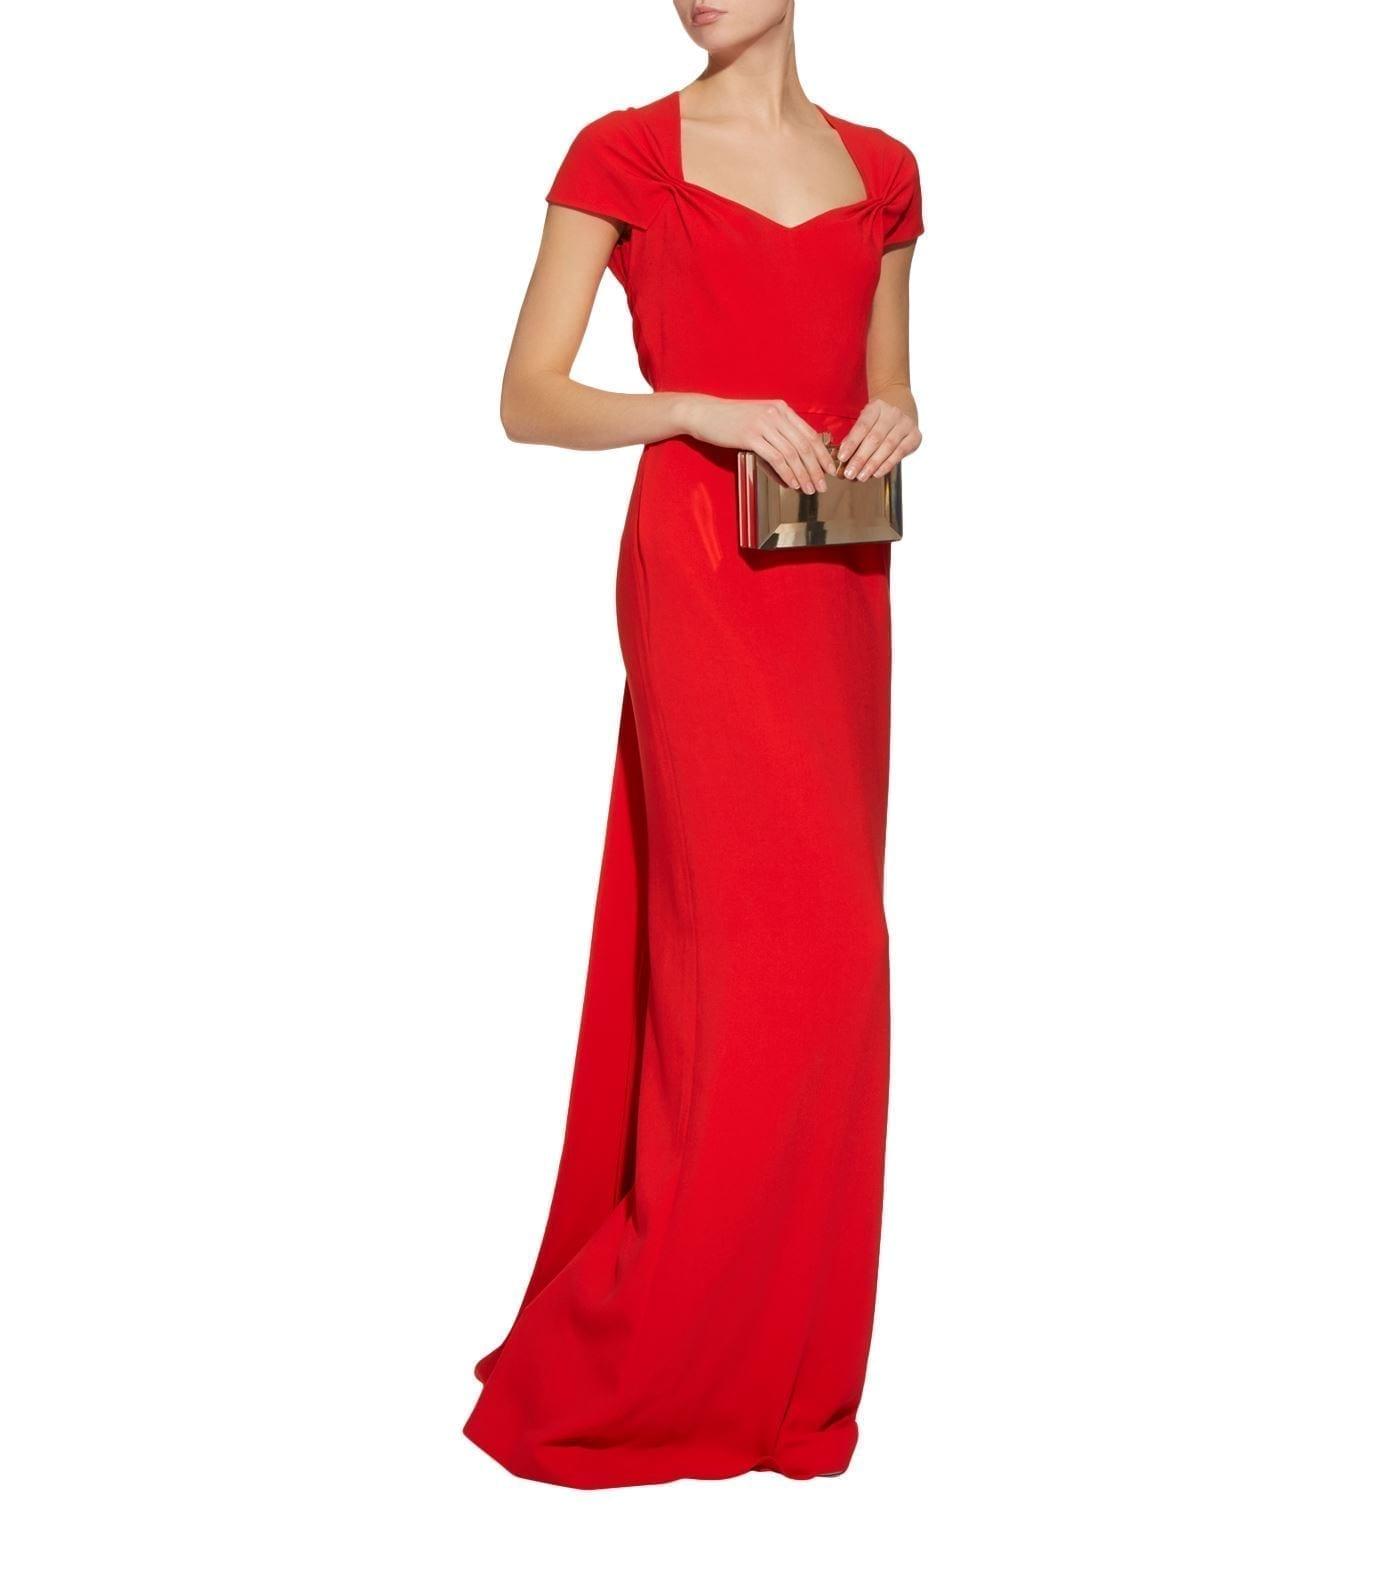 54def9df82cd6 STELLA MCCARTNEY Amal Pinched Shoulder Red Gown - We Select Dresses